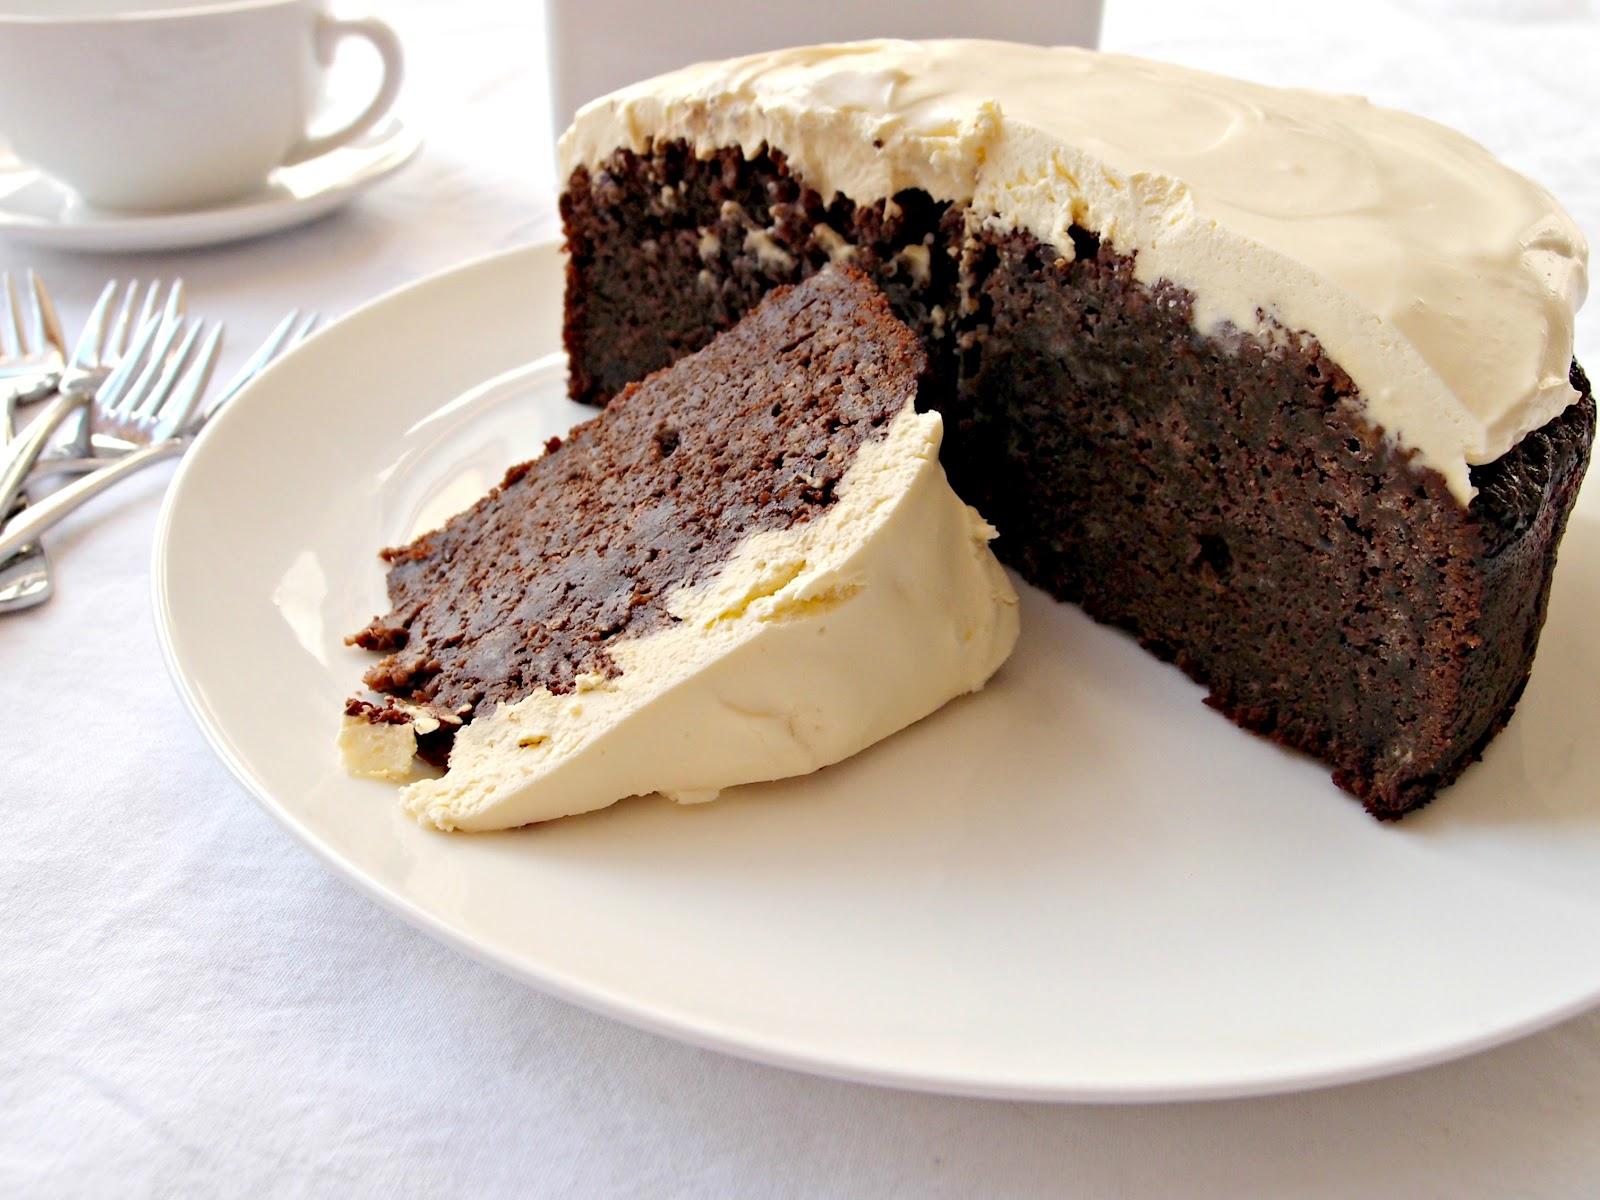 Chocolate Creme Fraiche Cake Topping